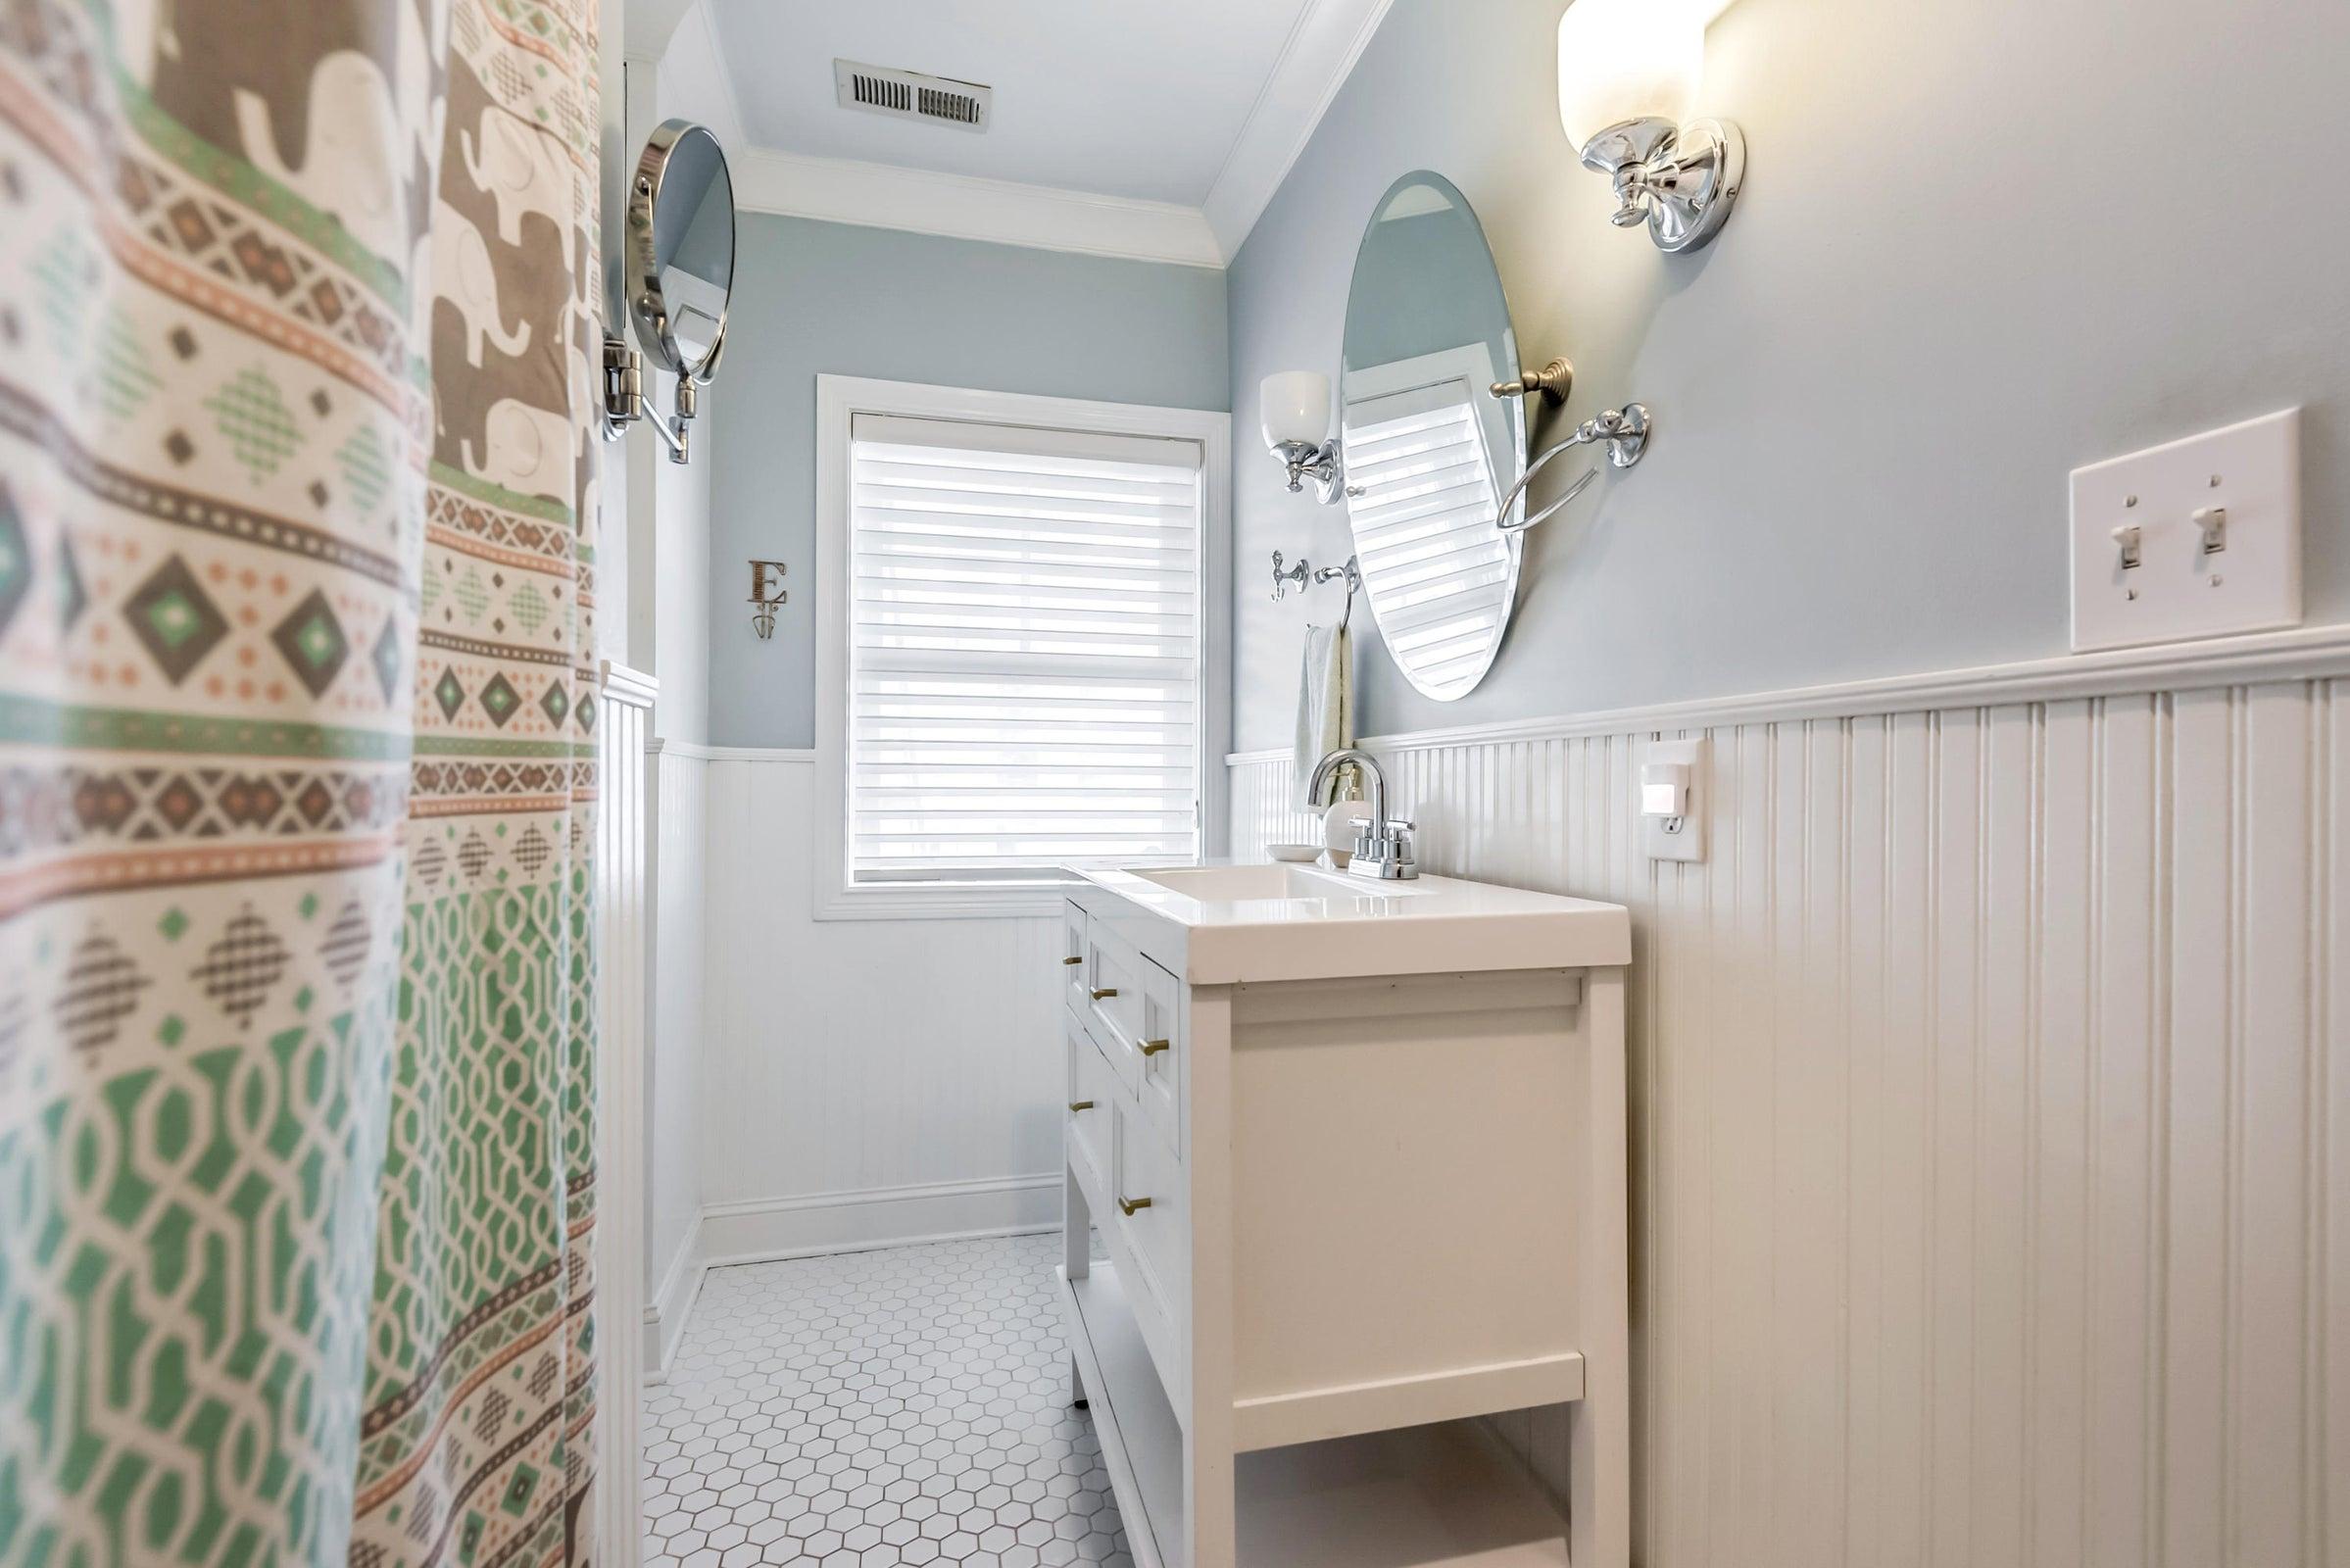 6612StoneMill-Hall bath 1